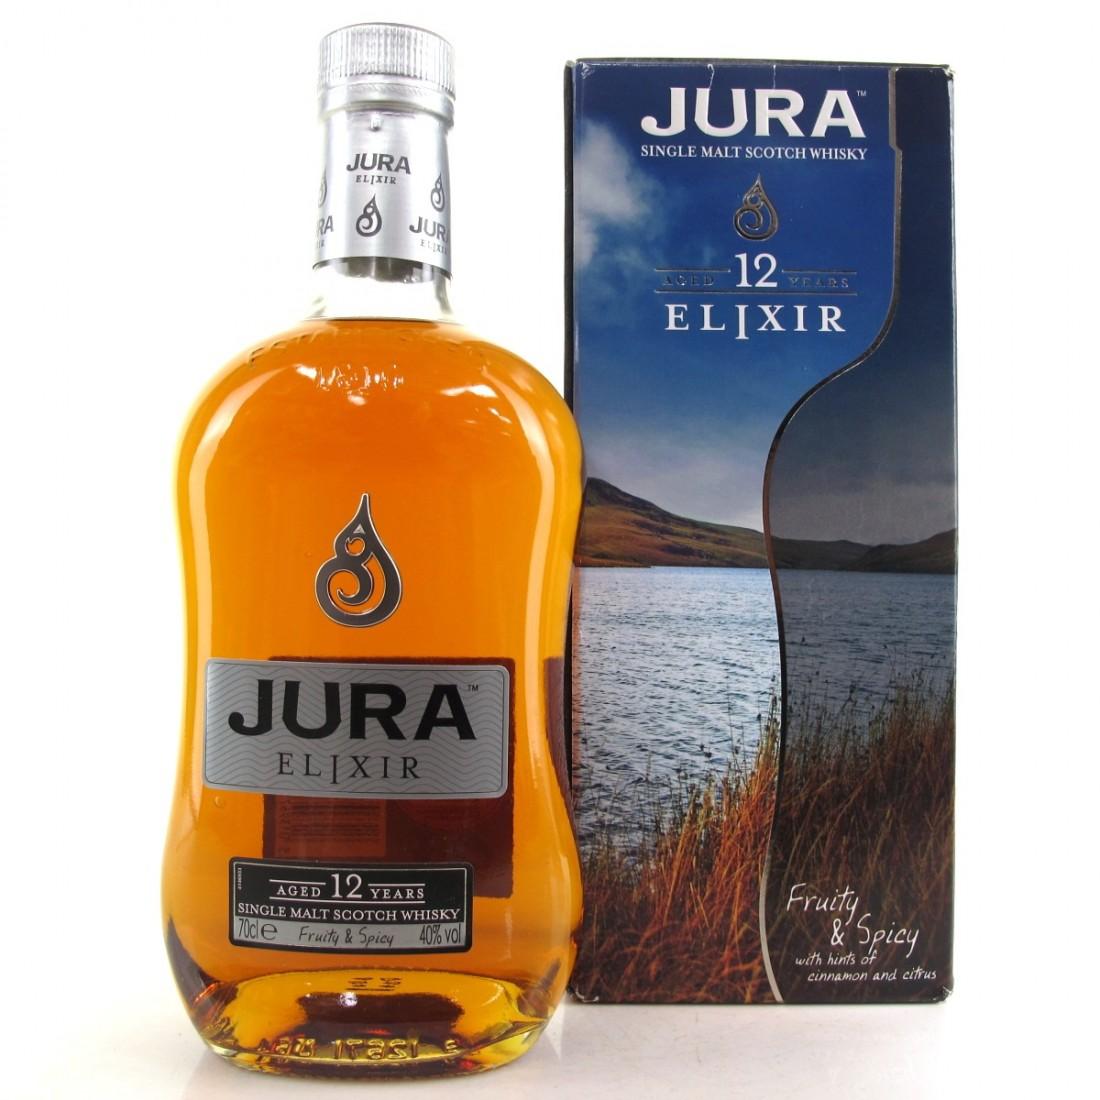 Jura 12 Year Old Elixir